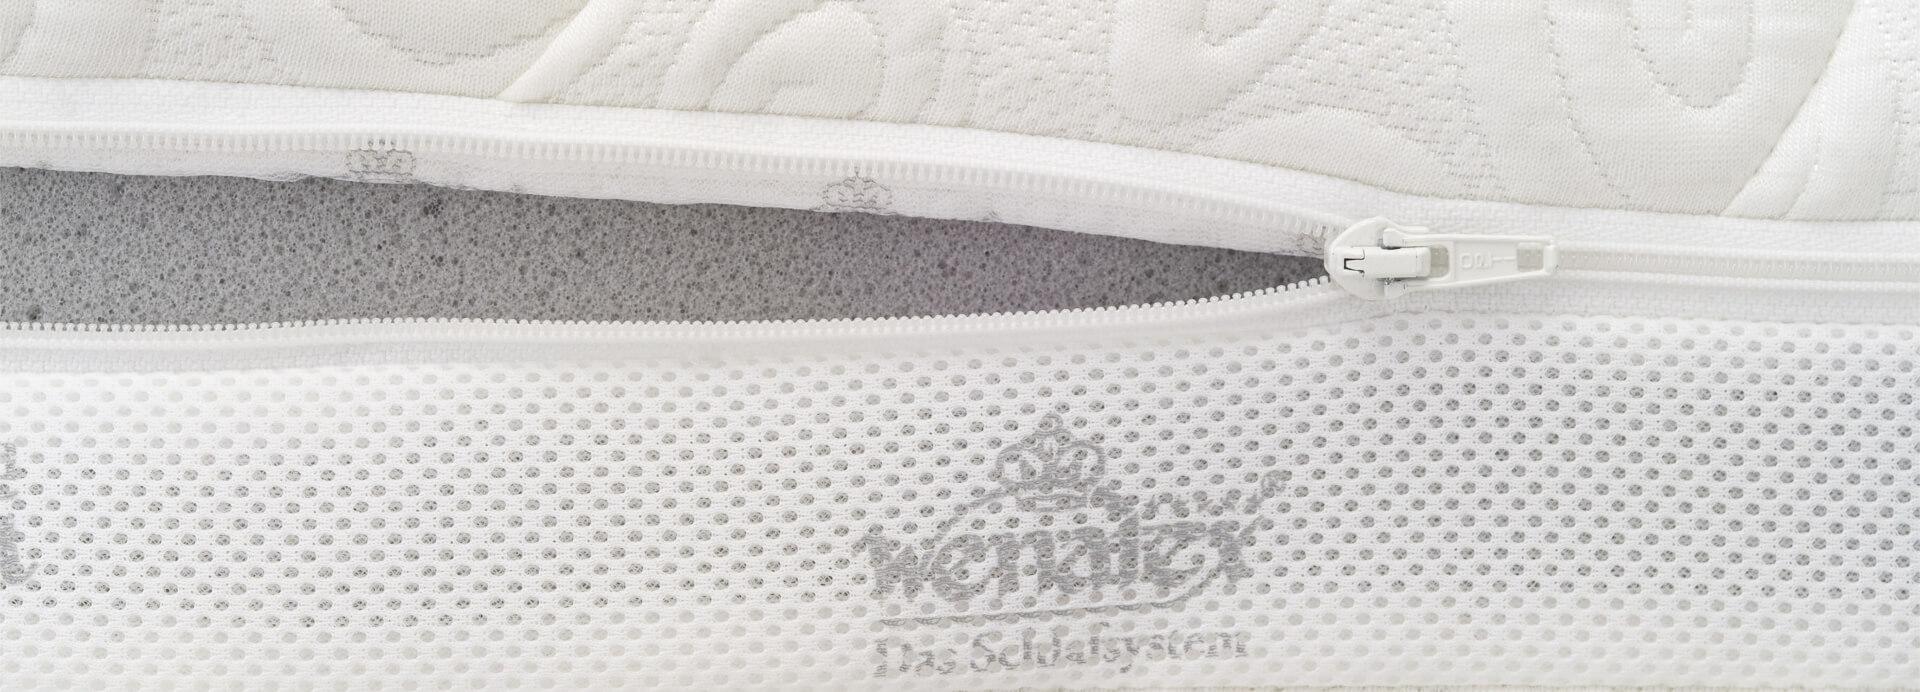 Wenatex Matratze Silvermed®